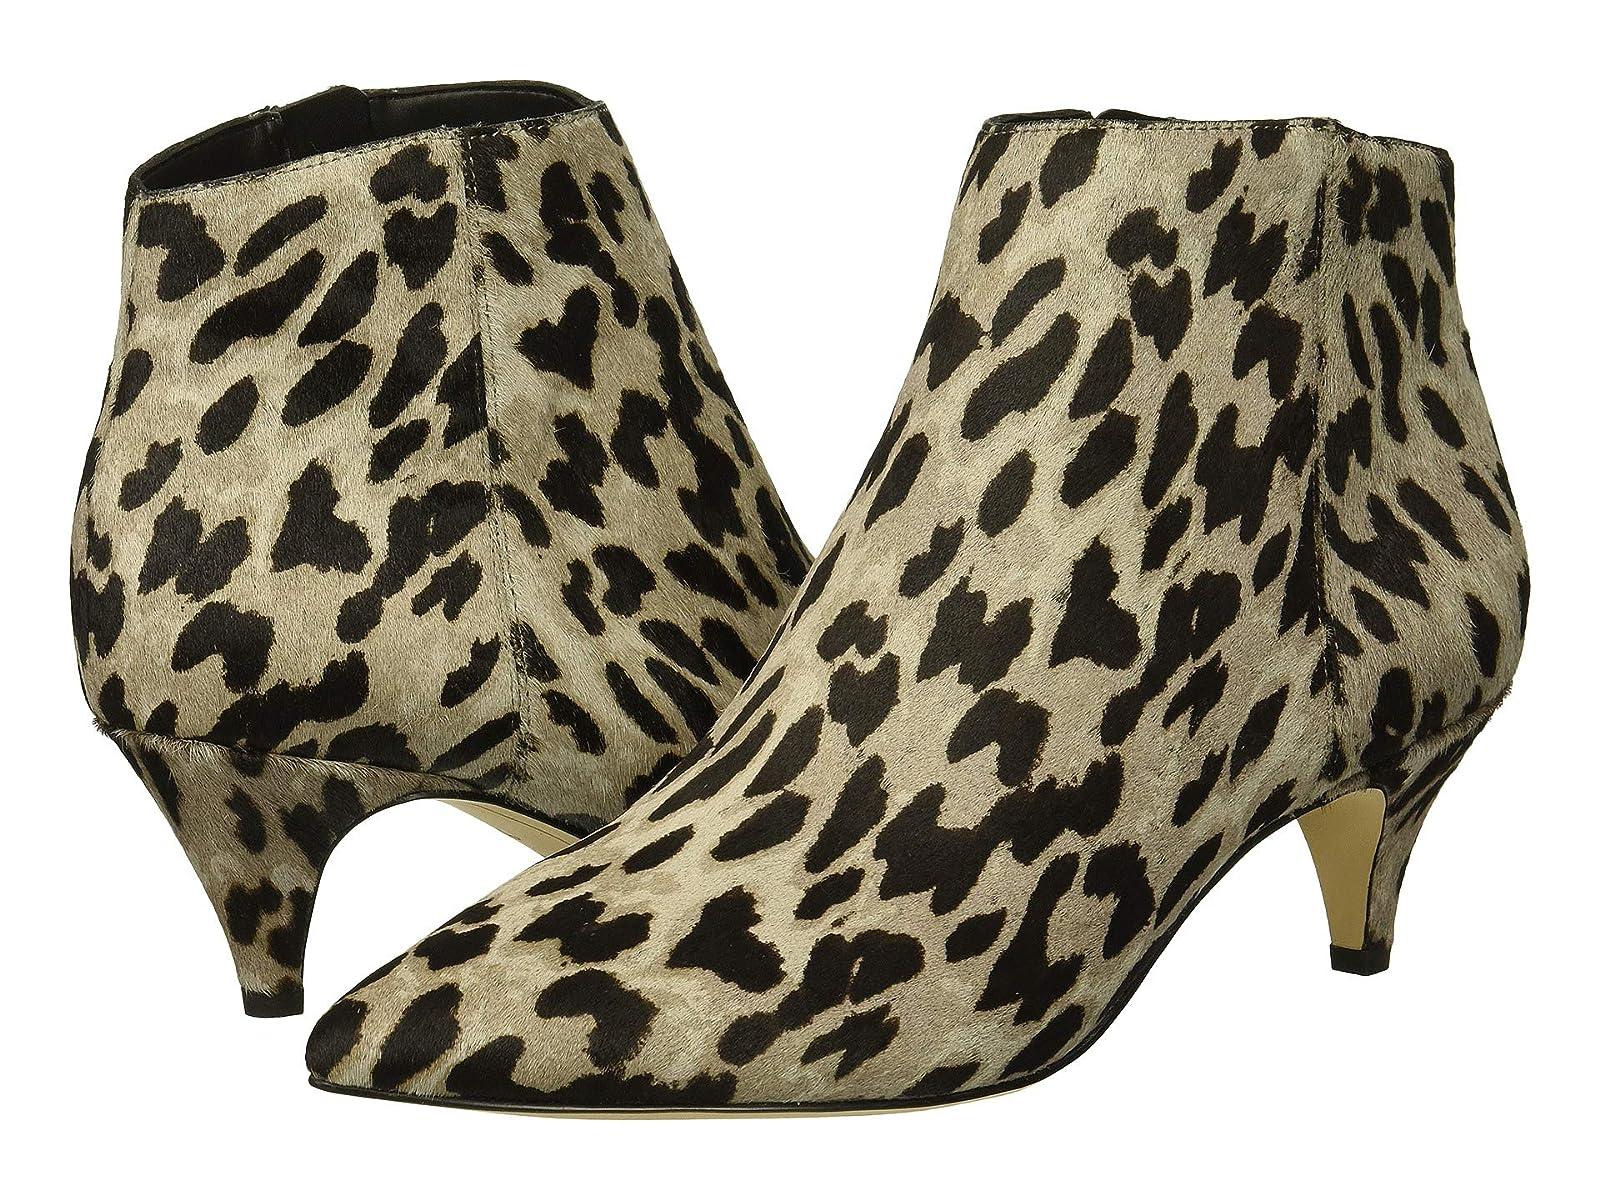 Sam Edelman KinzeyEconomical and quality shoes